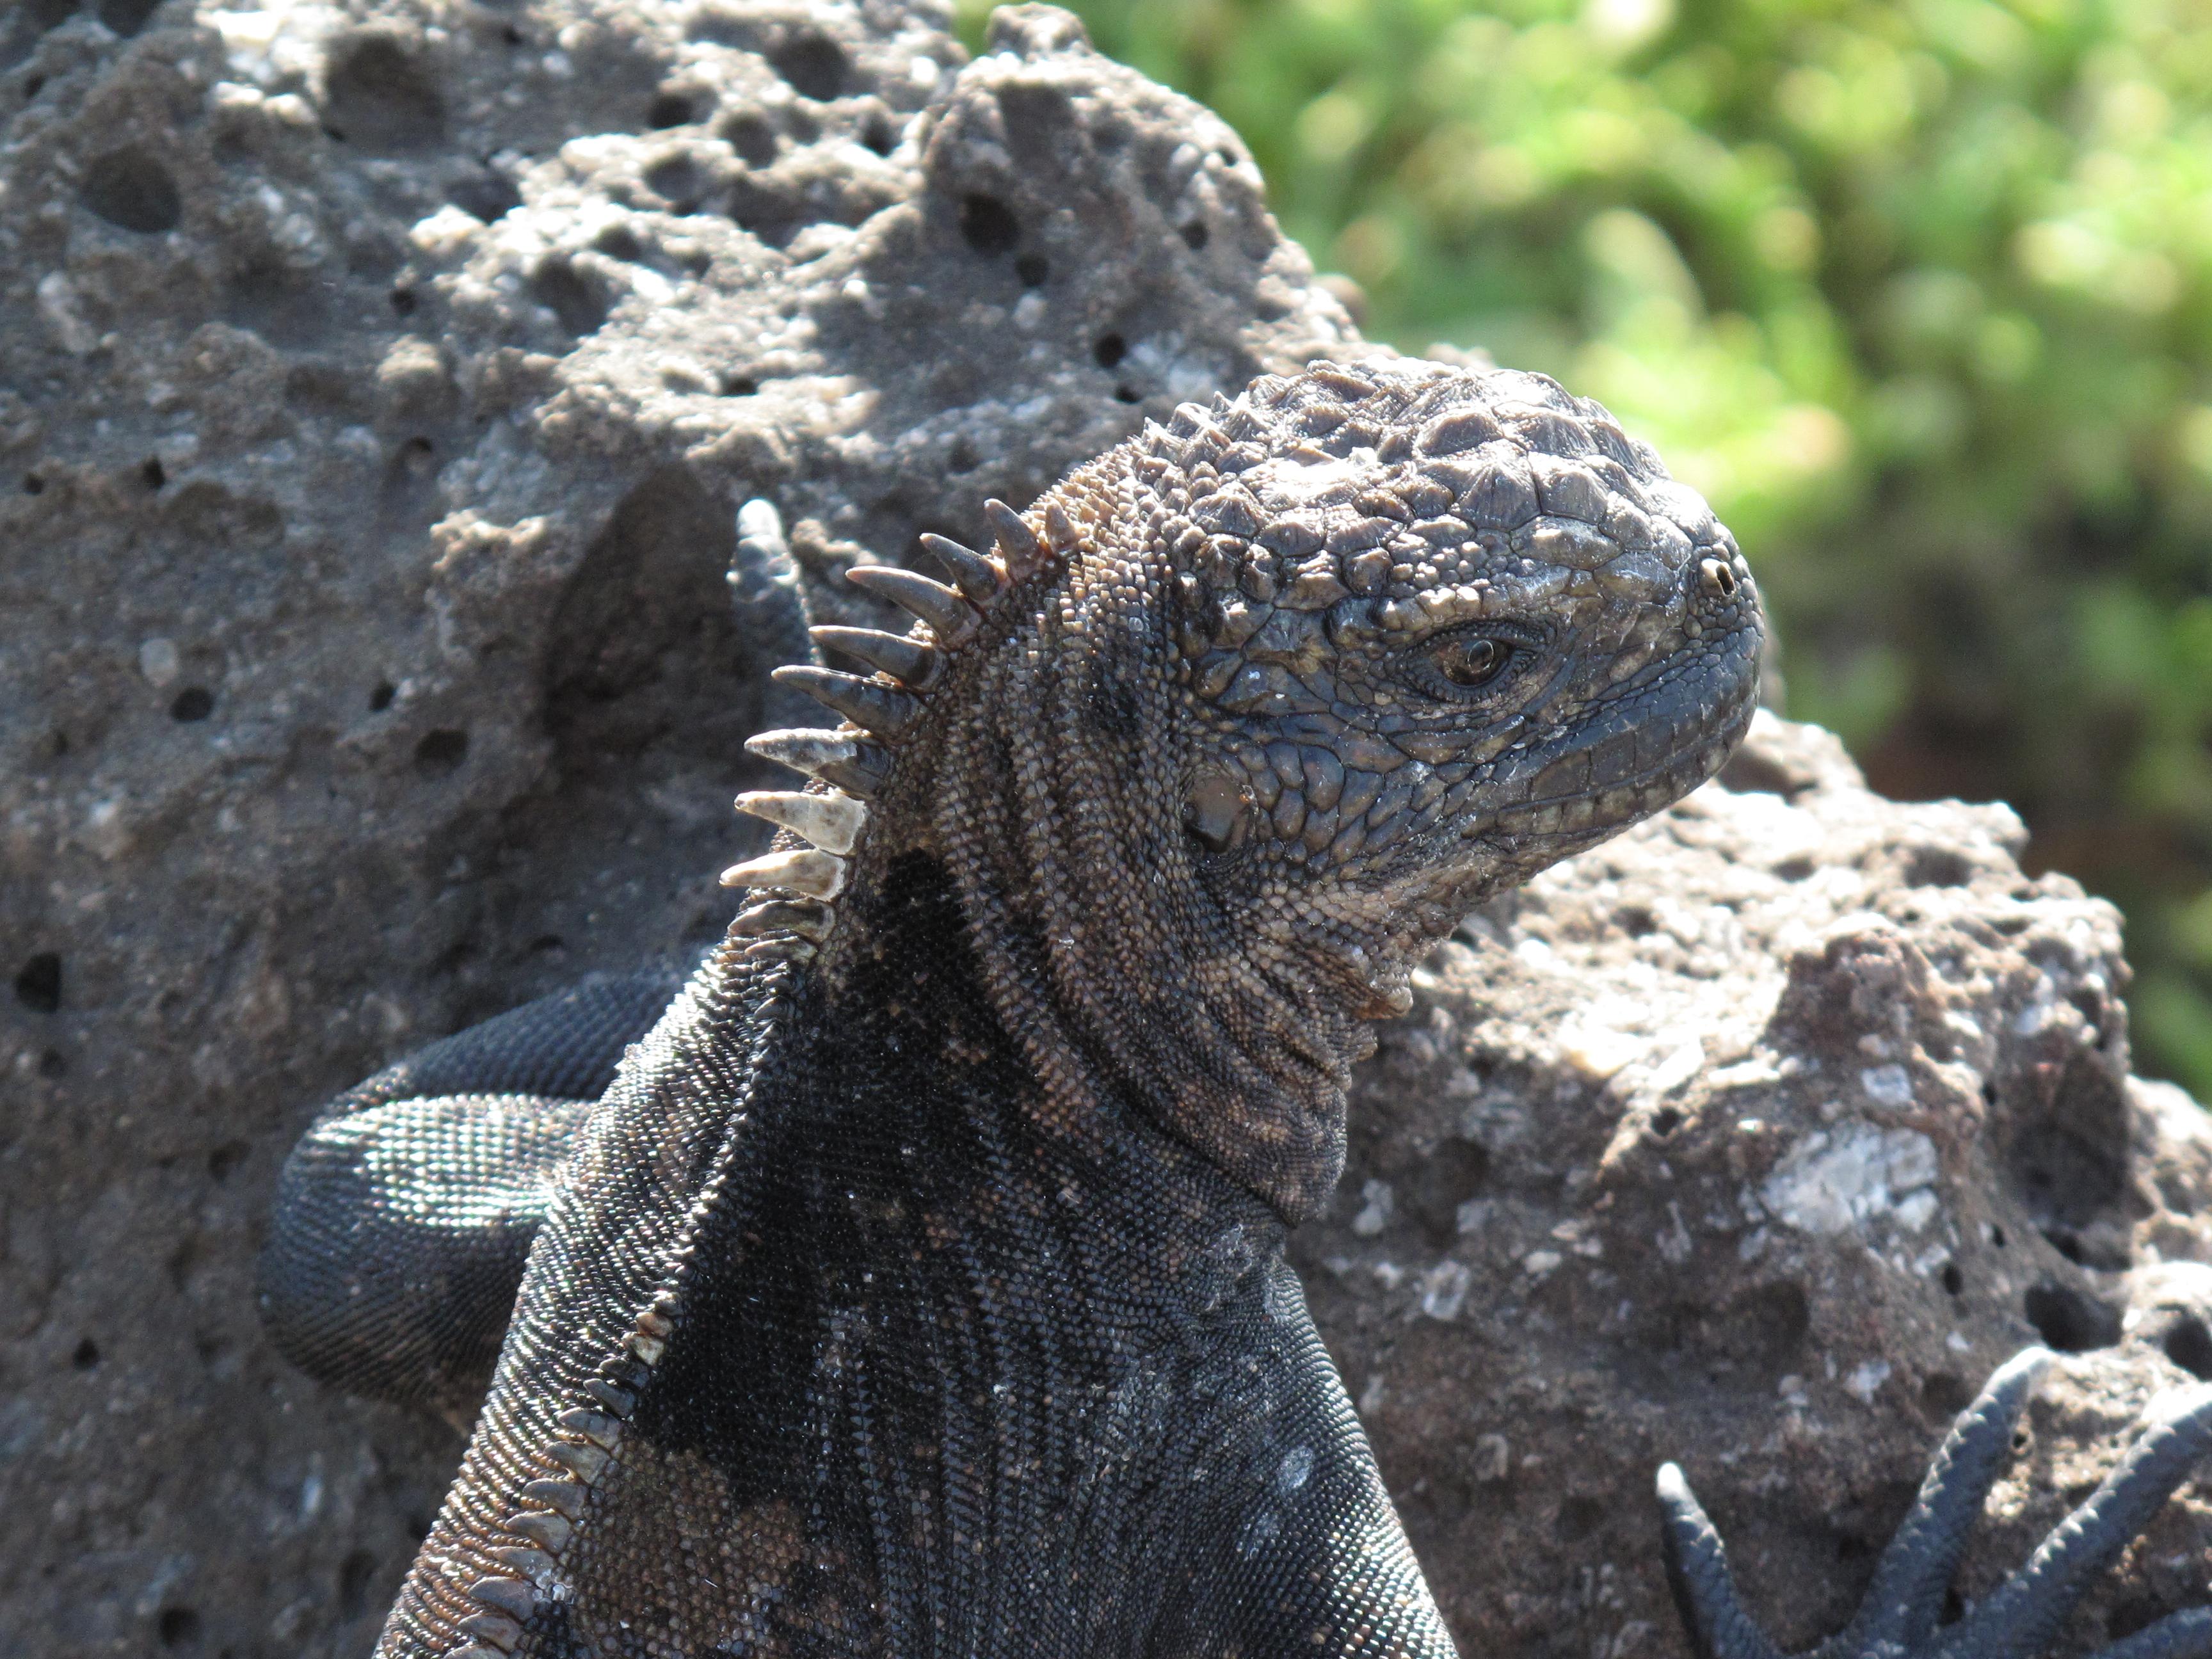 Photo Essay: The Galapagos Islands